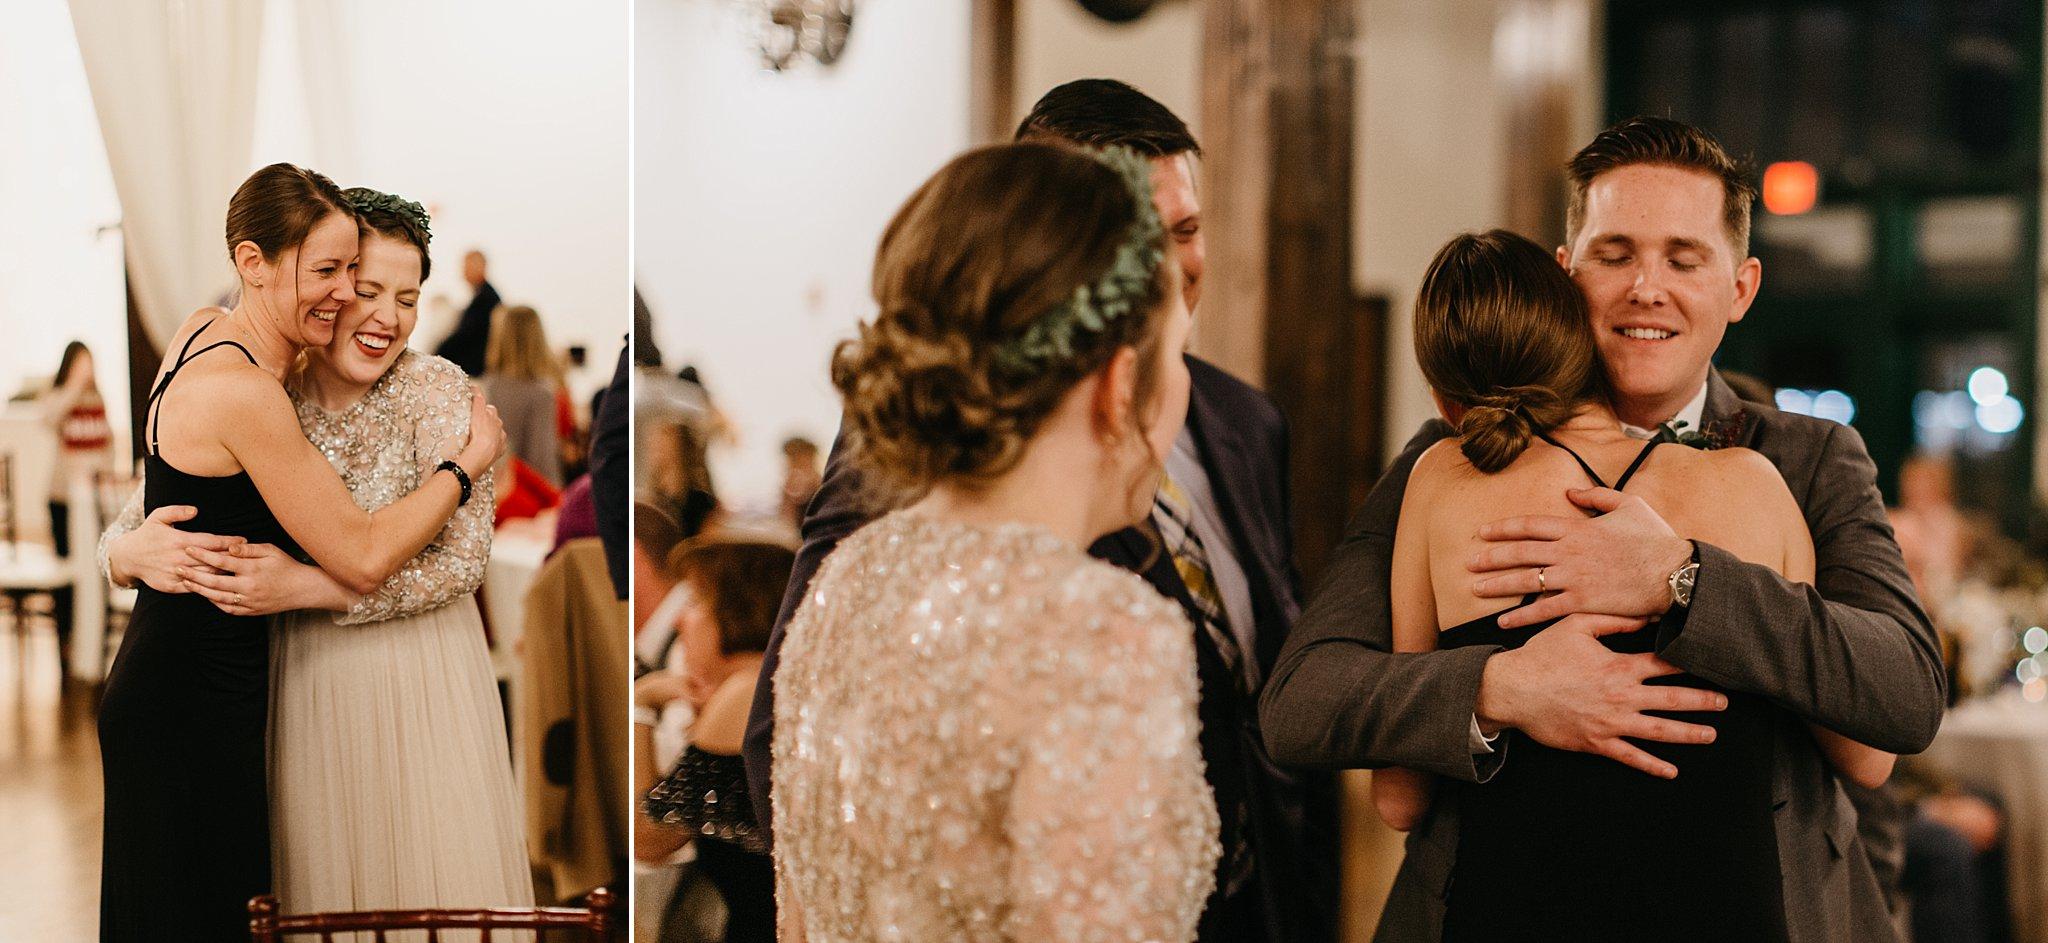 Wilderlove Co_Waco Texas_The Phoenix_Romantic Wedding Photography_0083.jpg